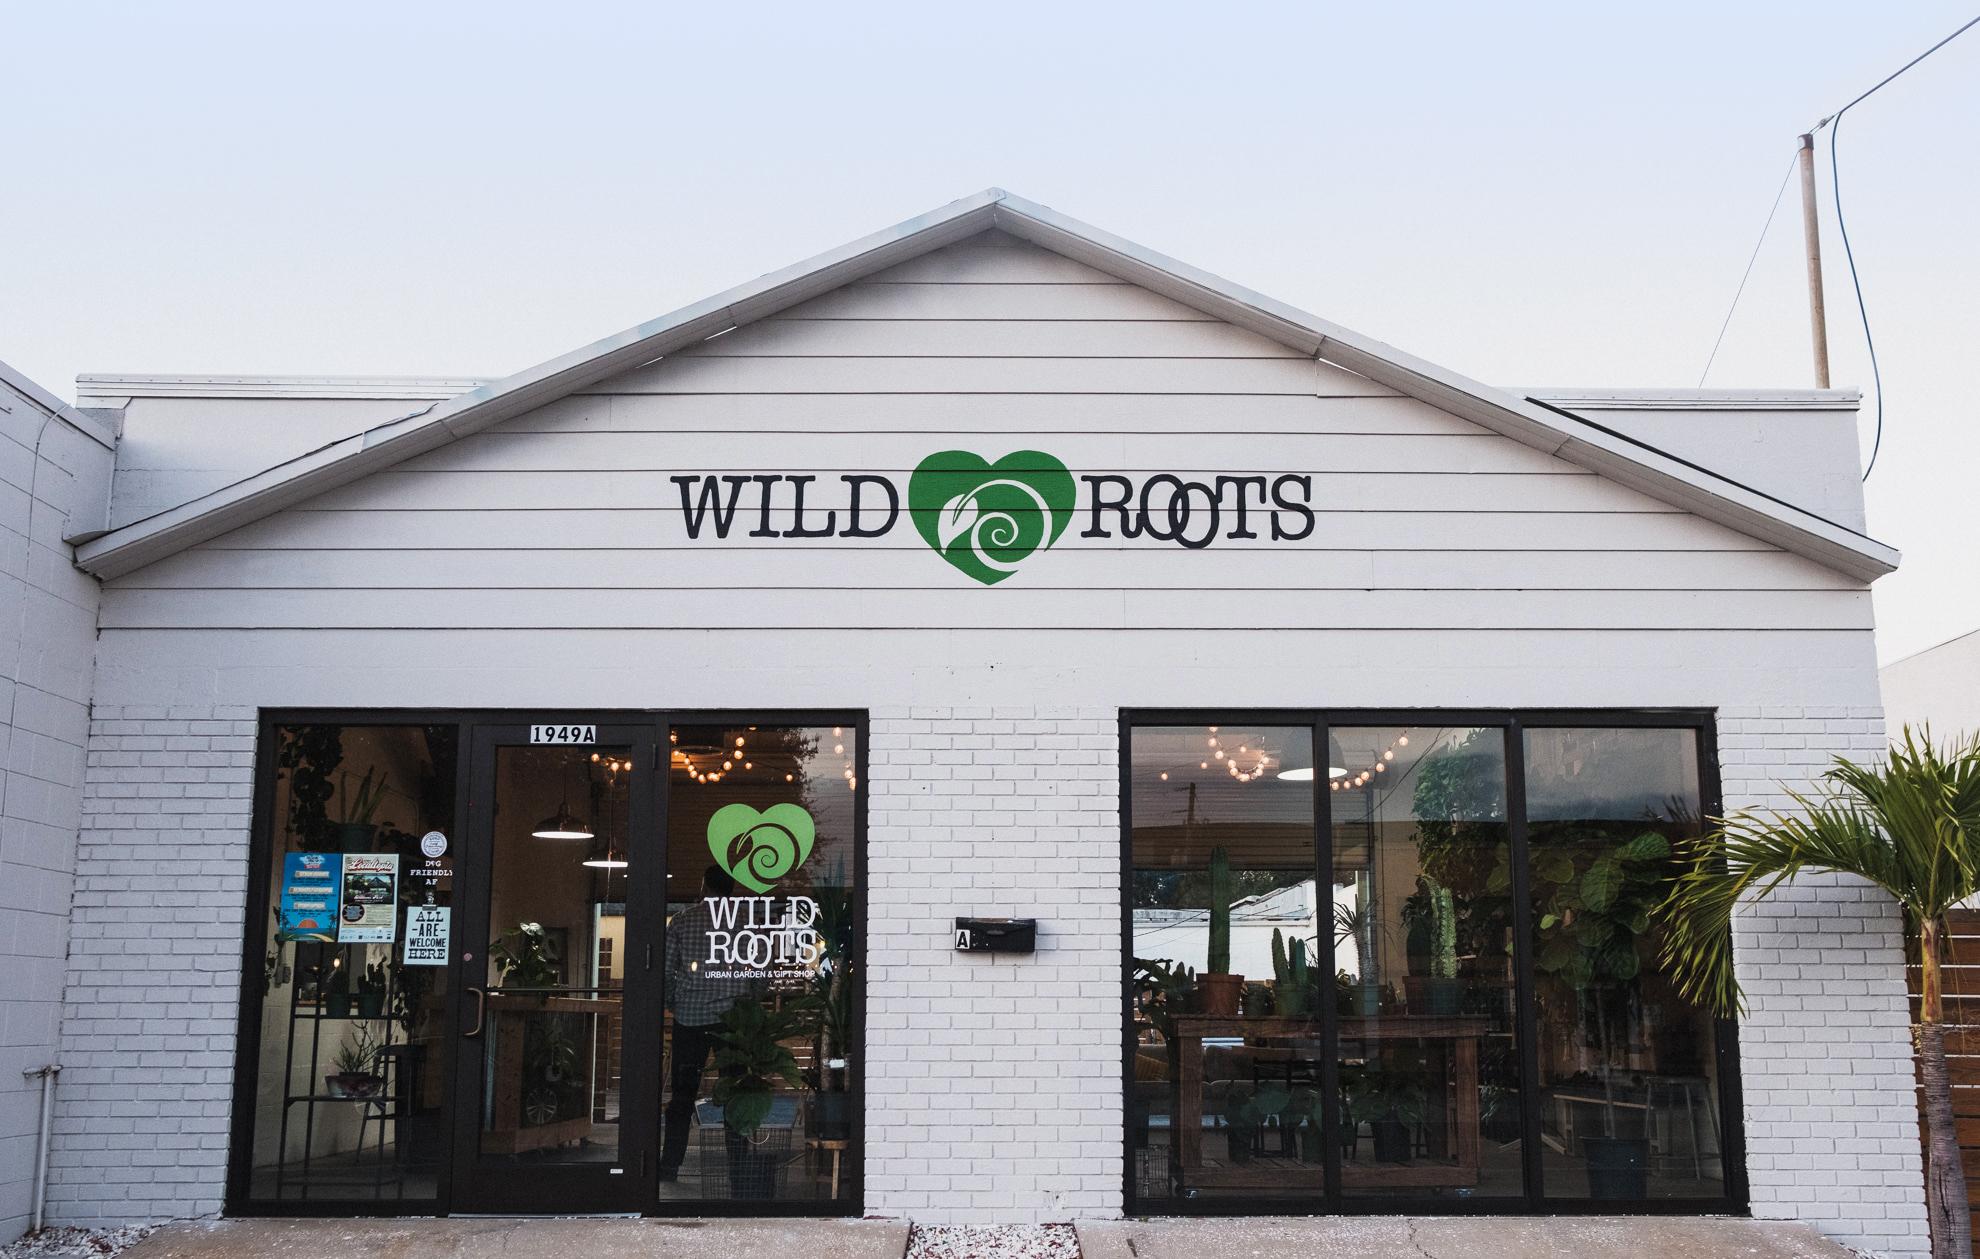 Leo-Gomez-Studio-Wild-Roots-Storefront-Signage.jpg